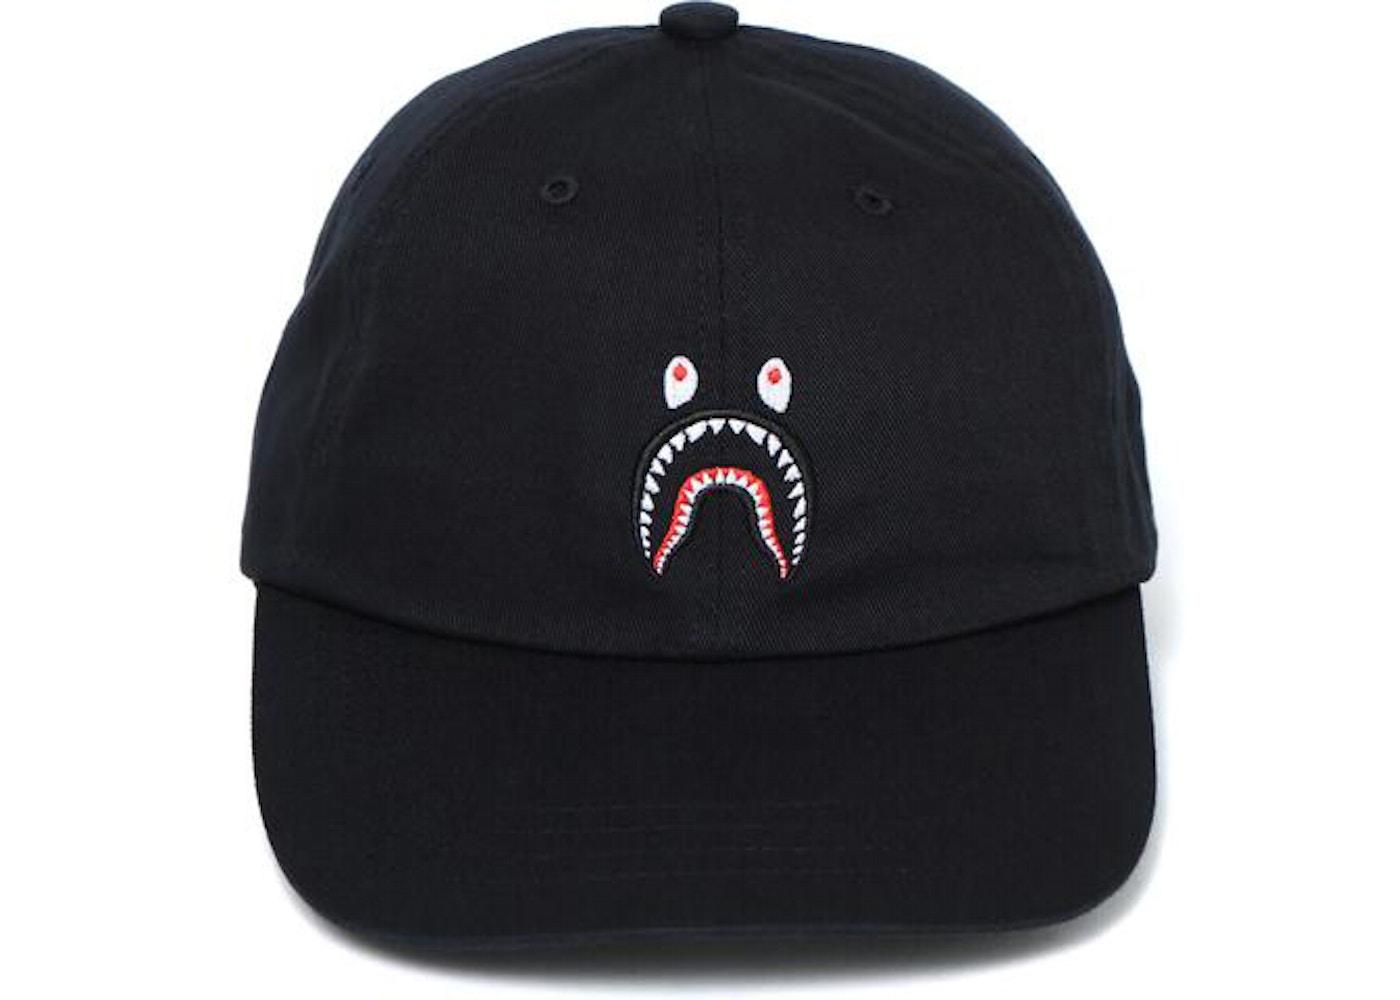 BAPE Shark Panel Cap Black. Shark Panel ec17167e2f6